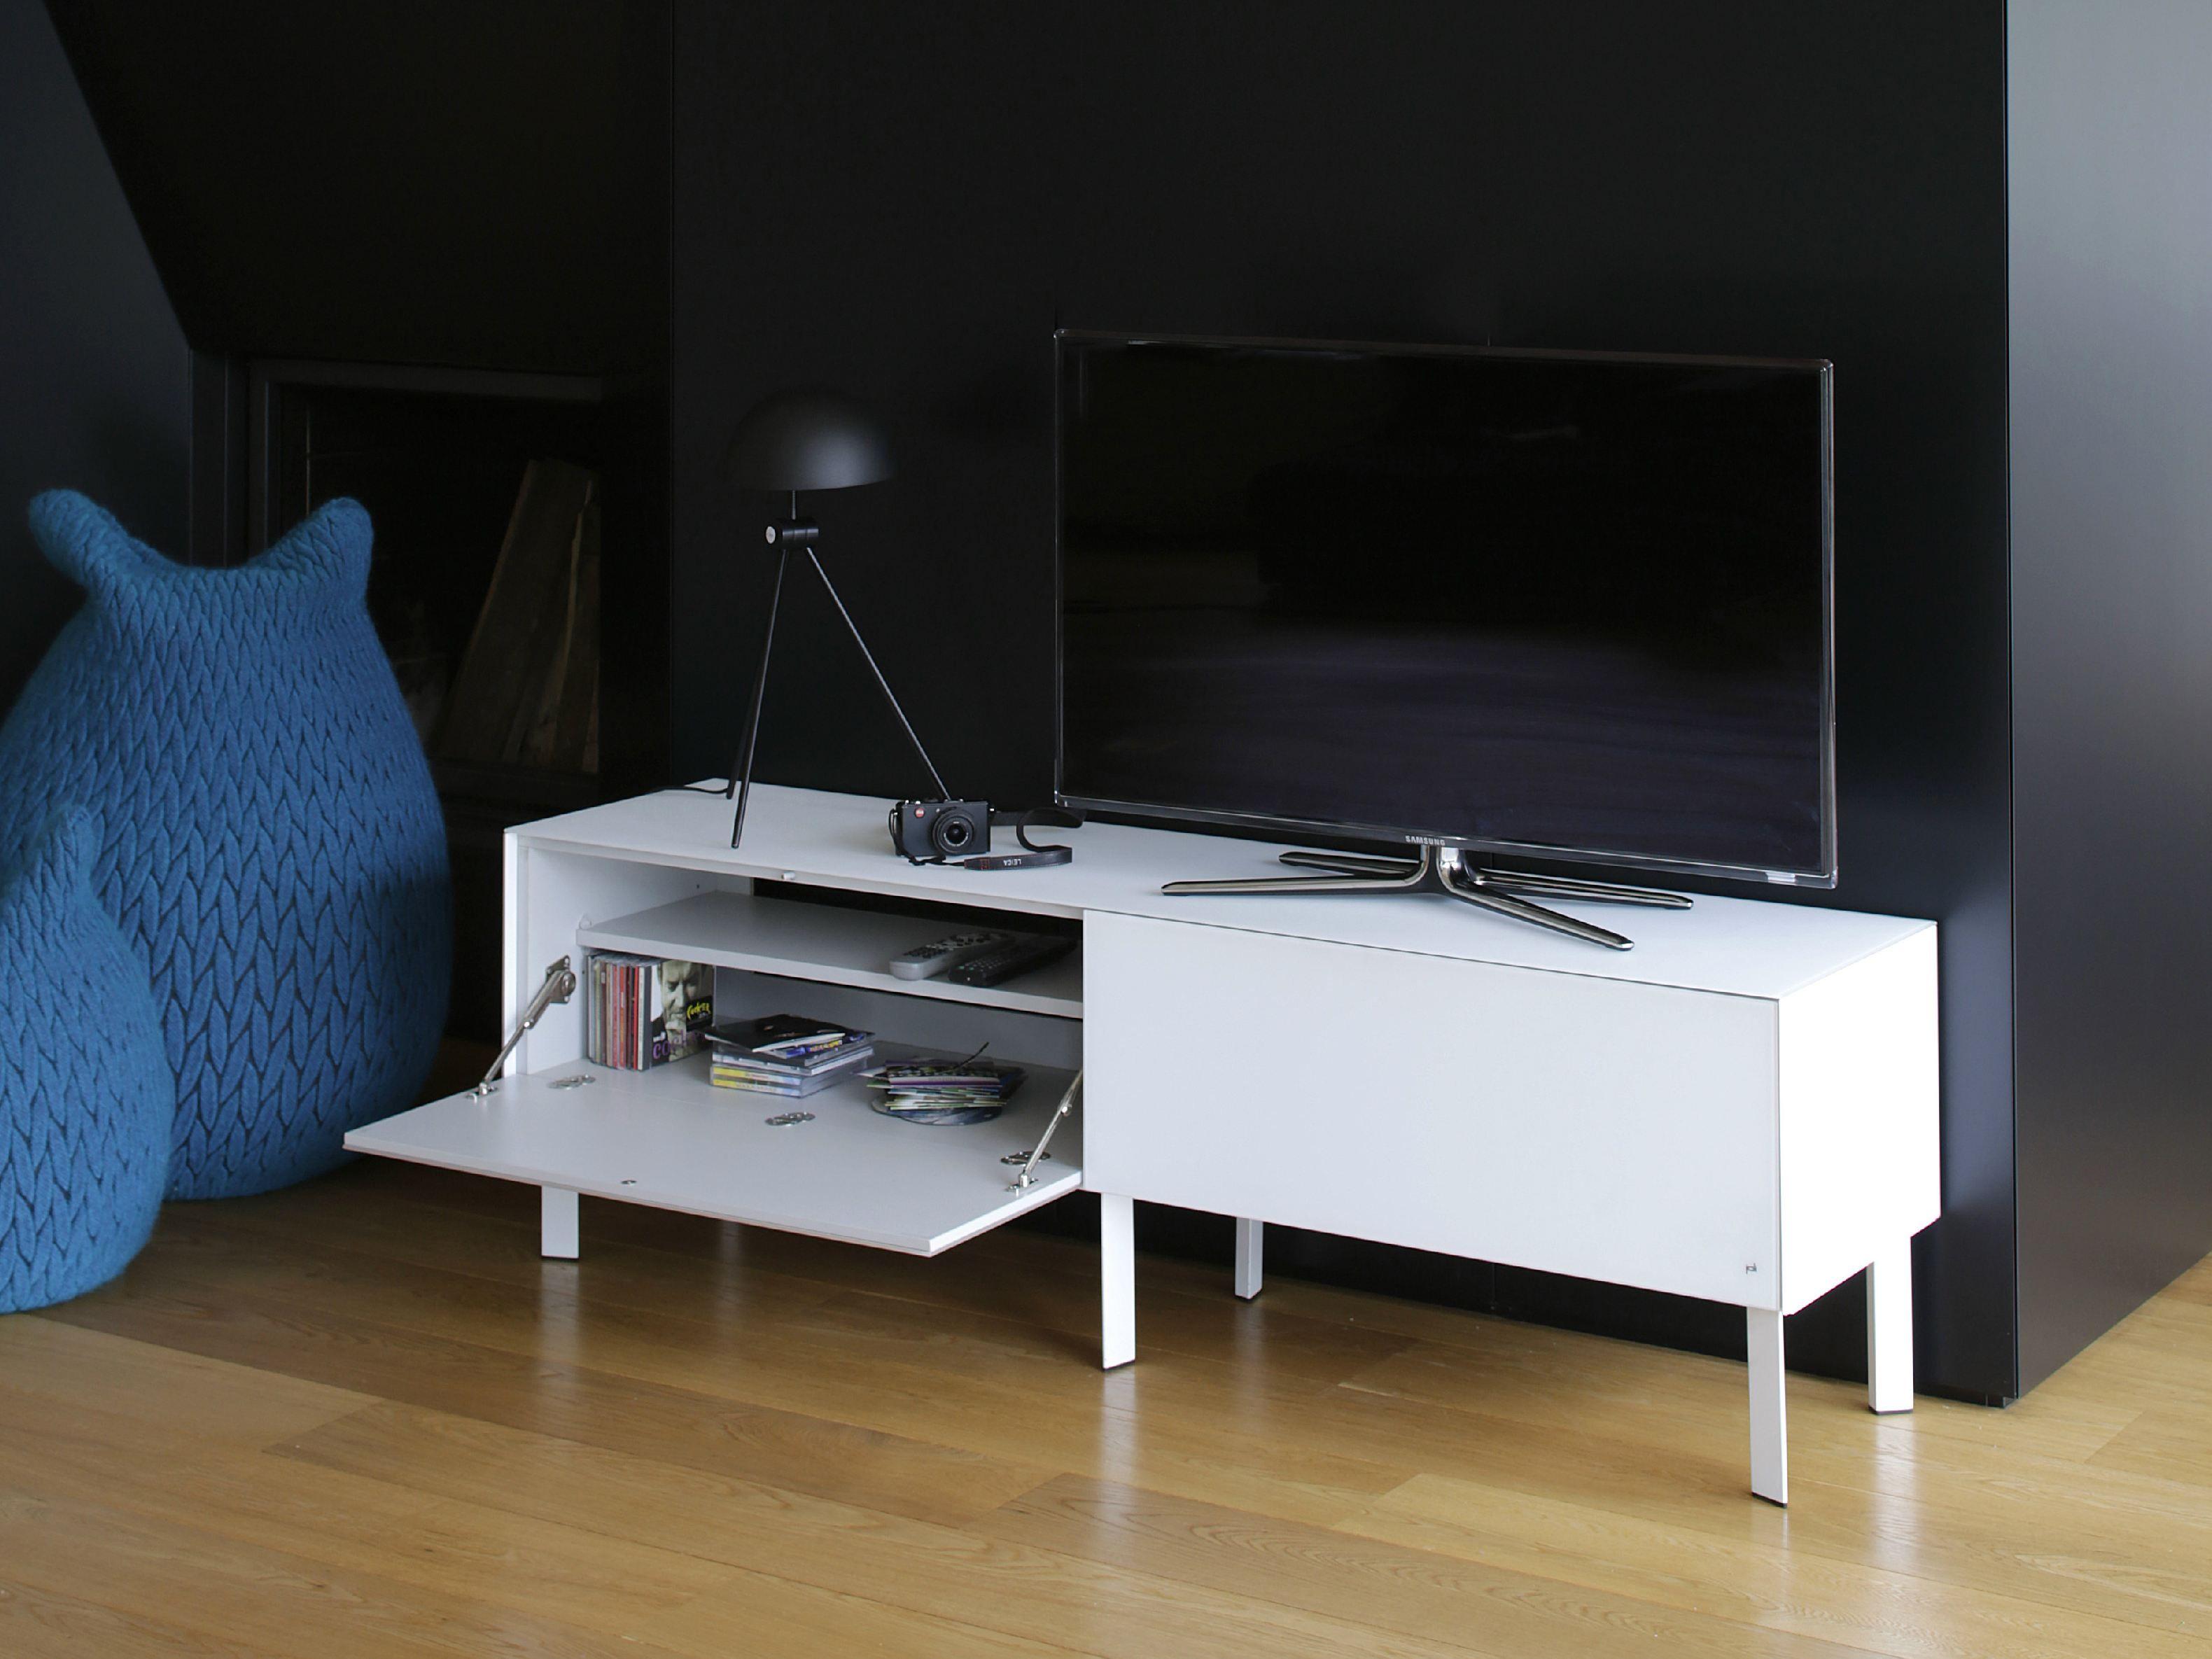 Meuble Tv Retractable Frdesignhub Co # Meuble Tv Retractable